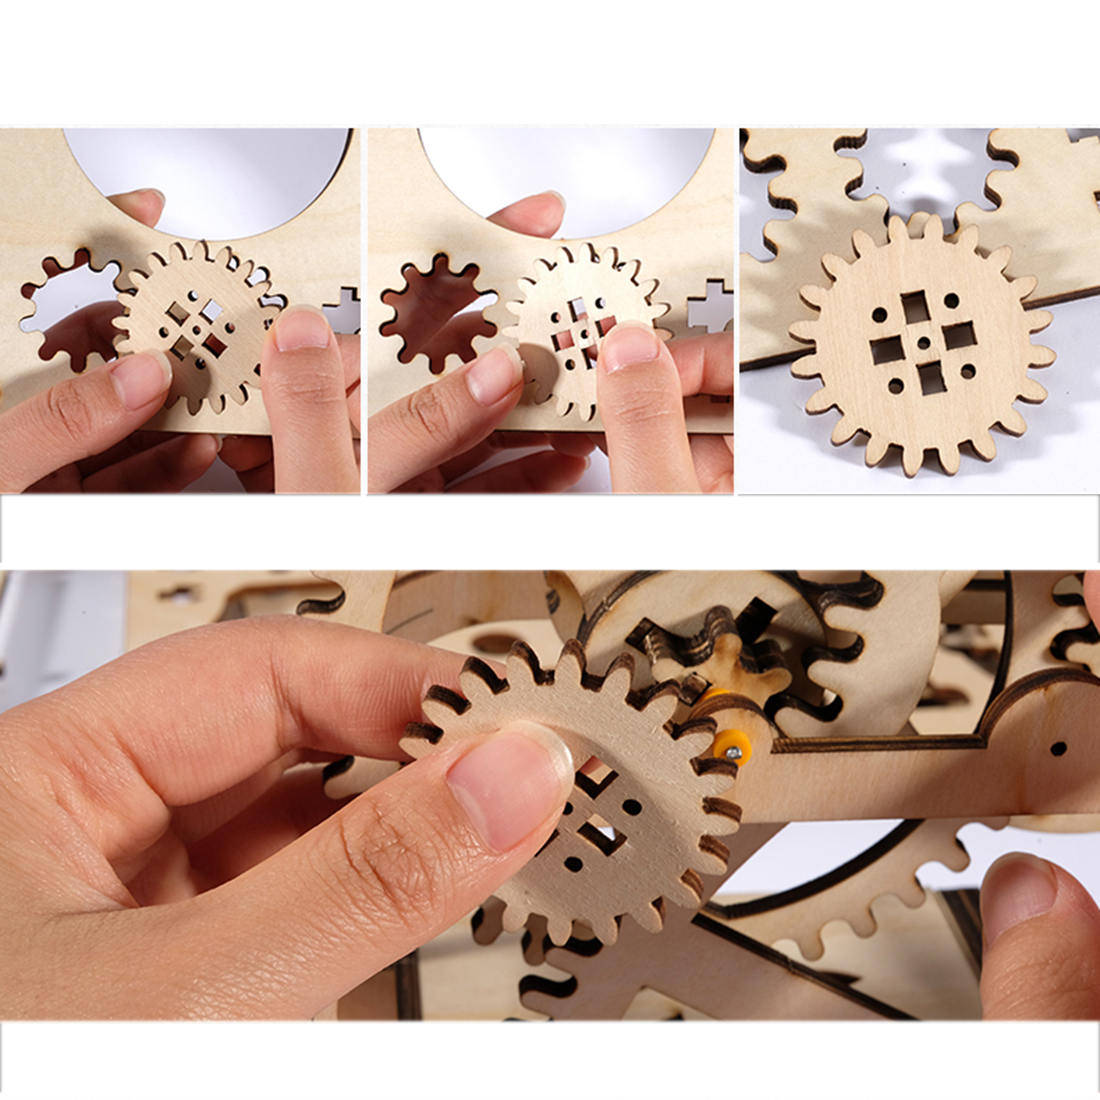 Marble Rocker DIY Marble Run 3D Model